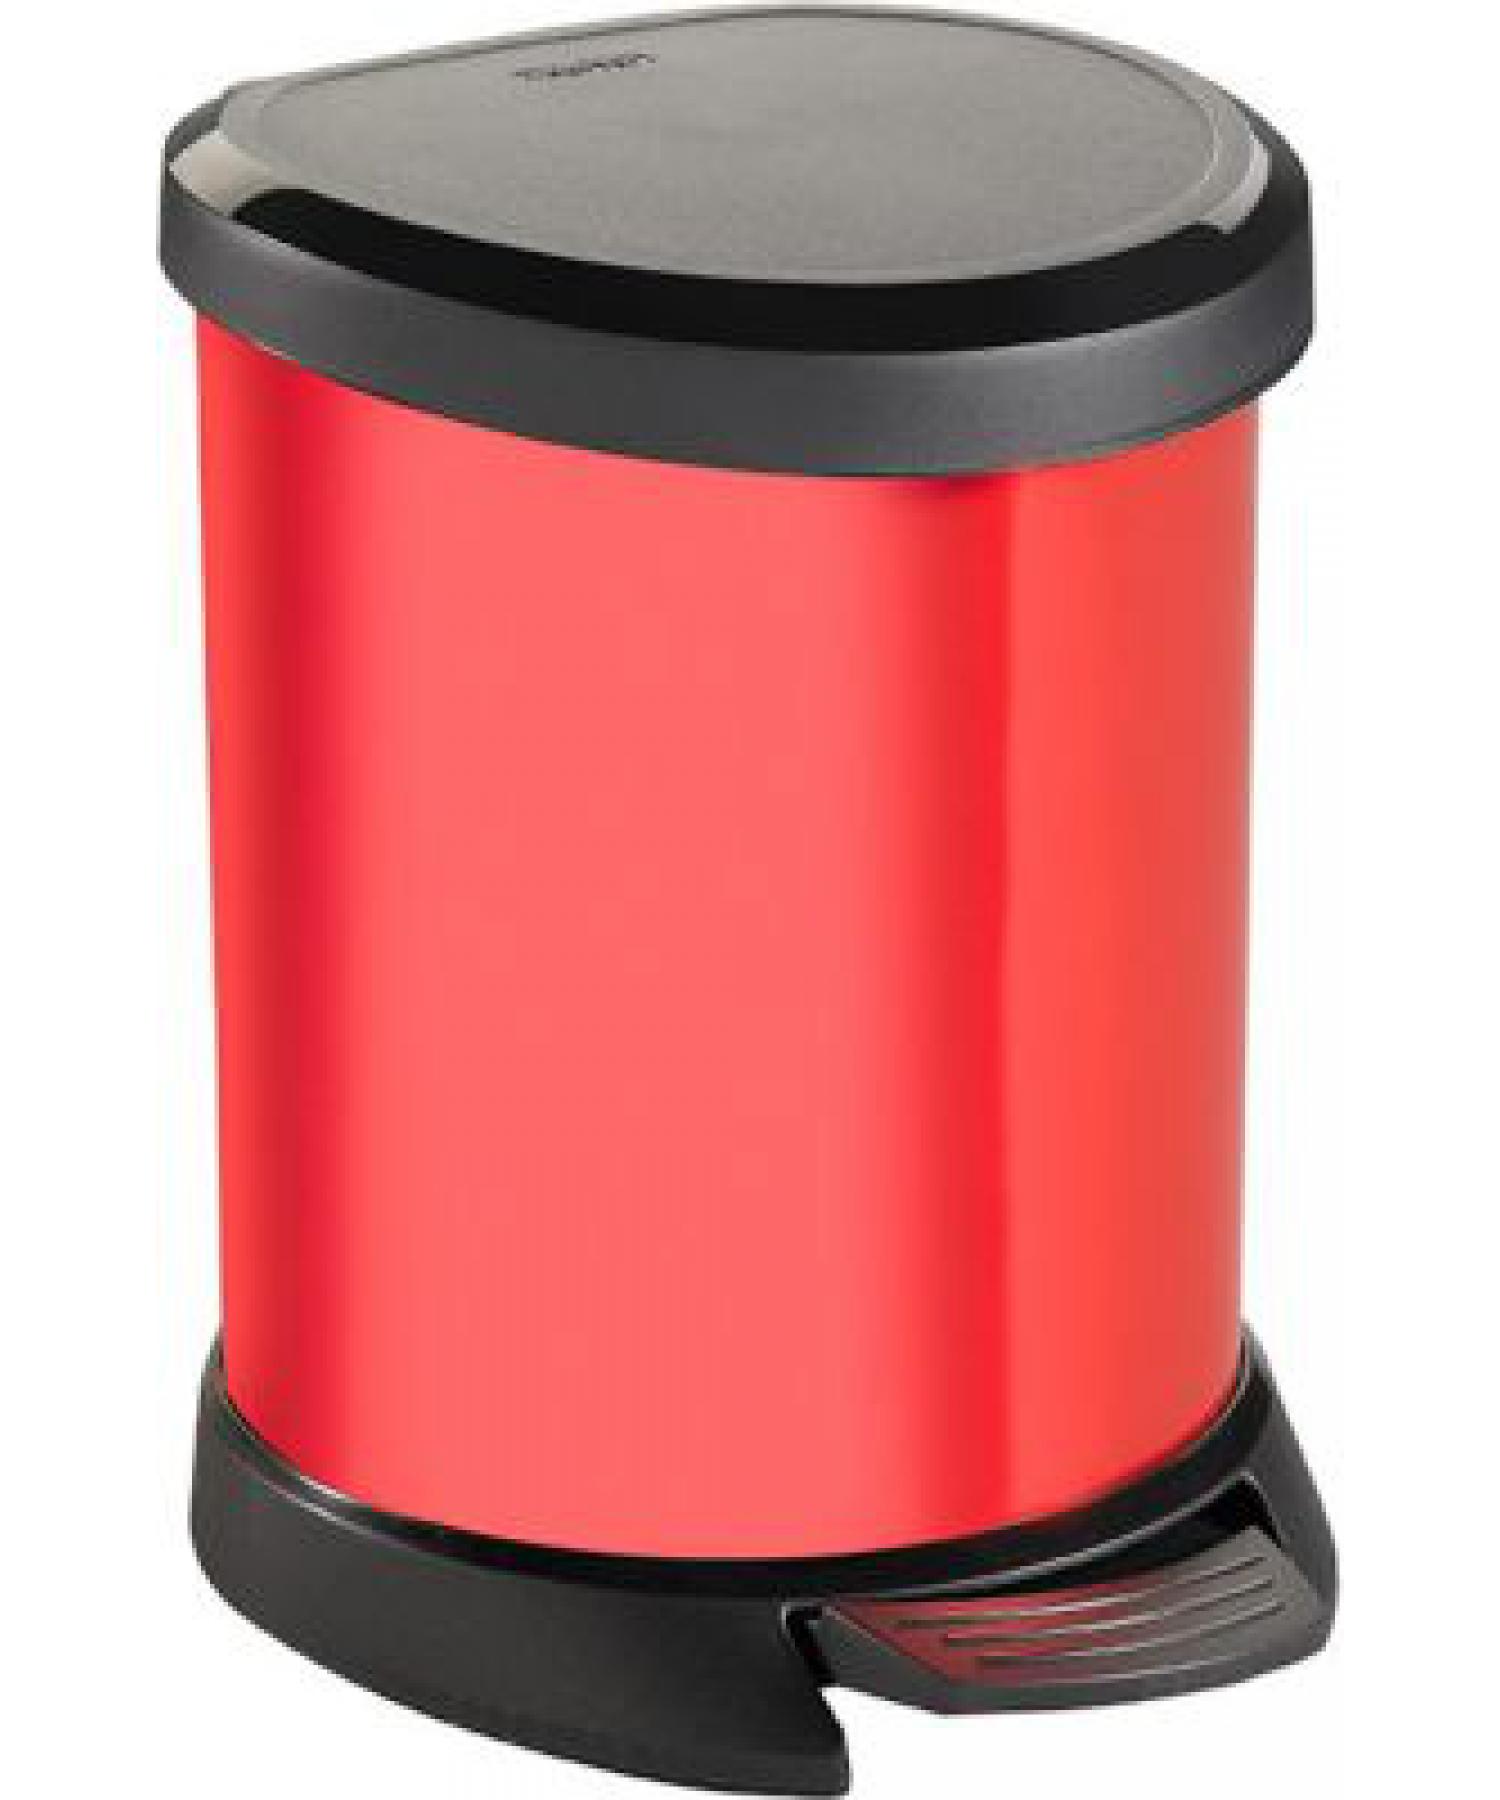 Deco Bin Pedal -20L Red